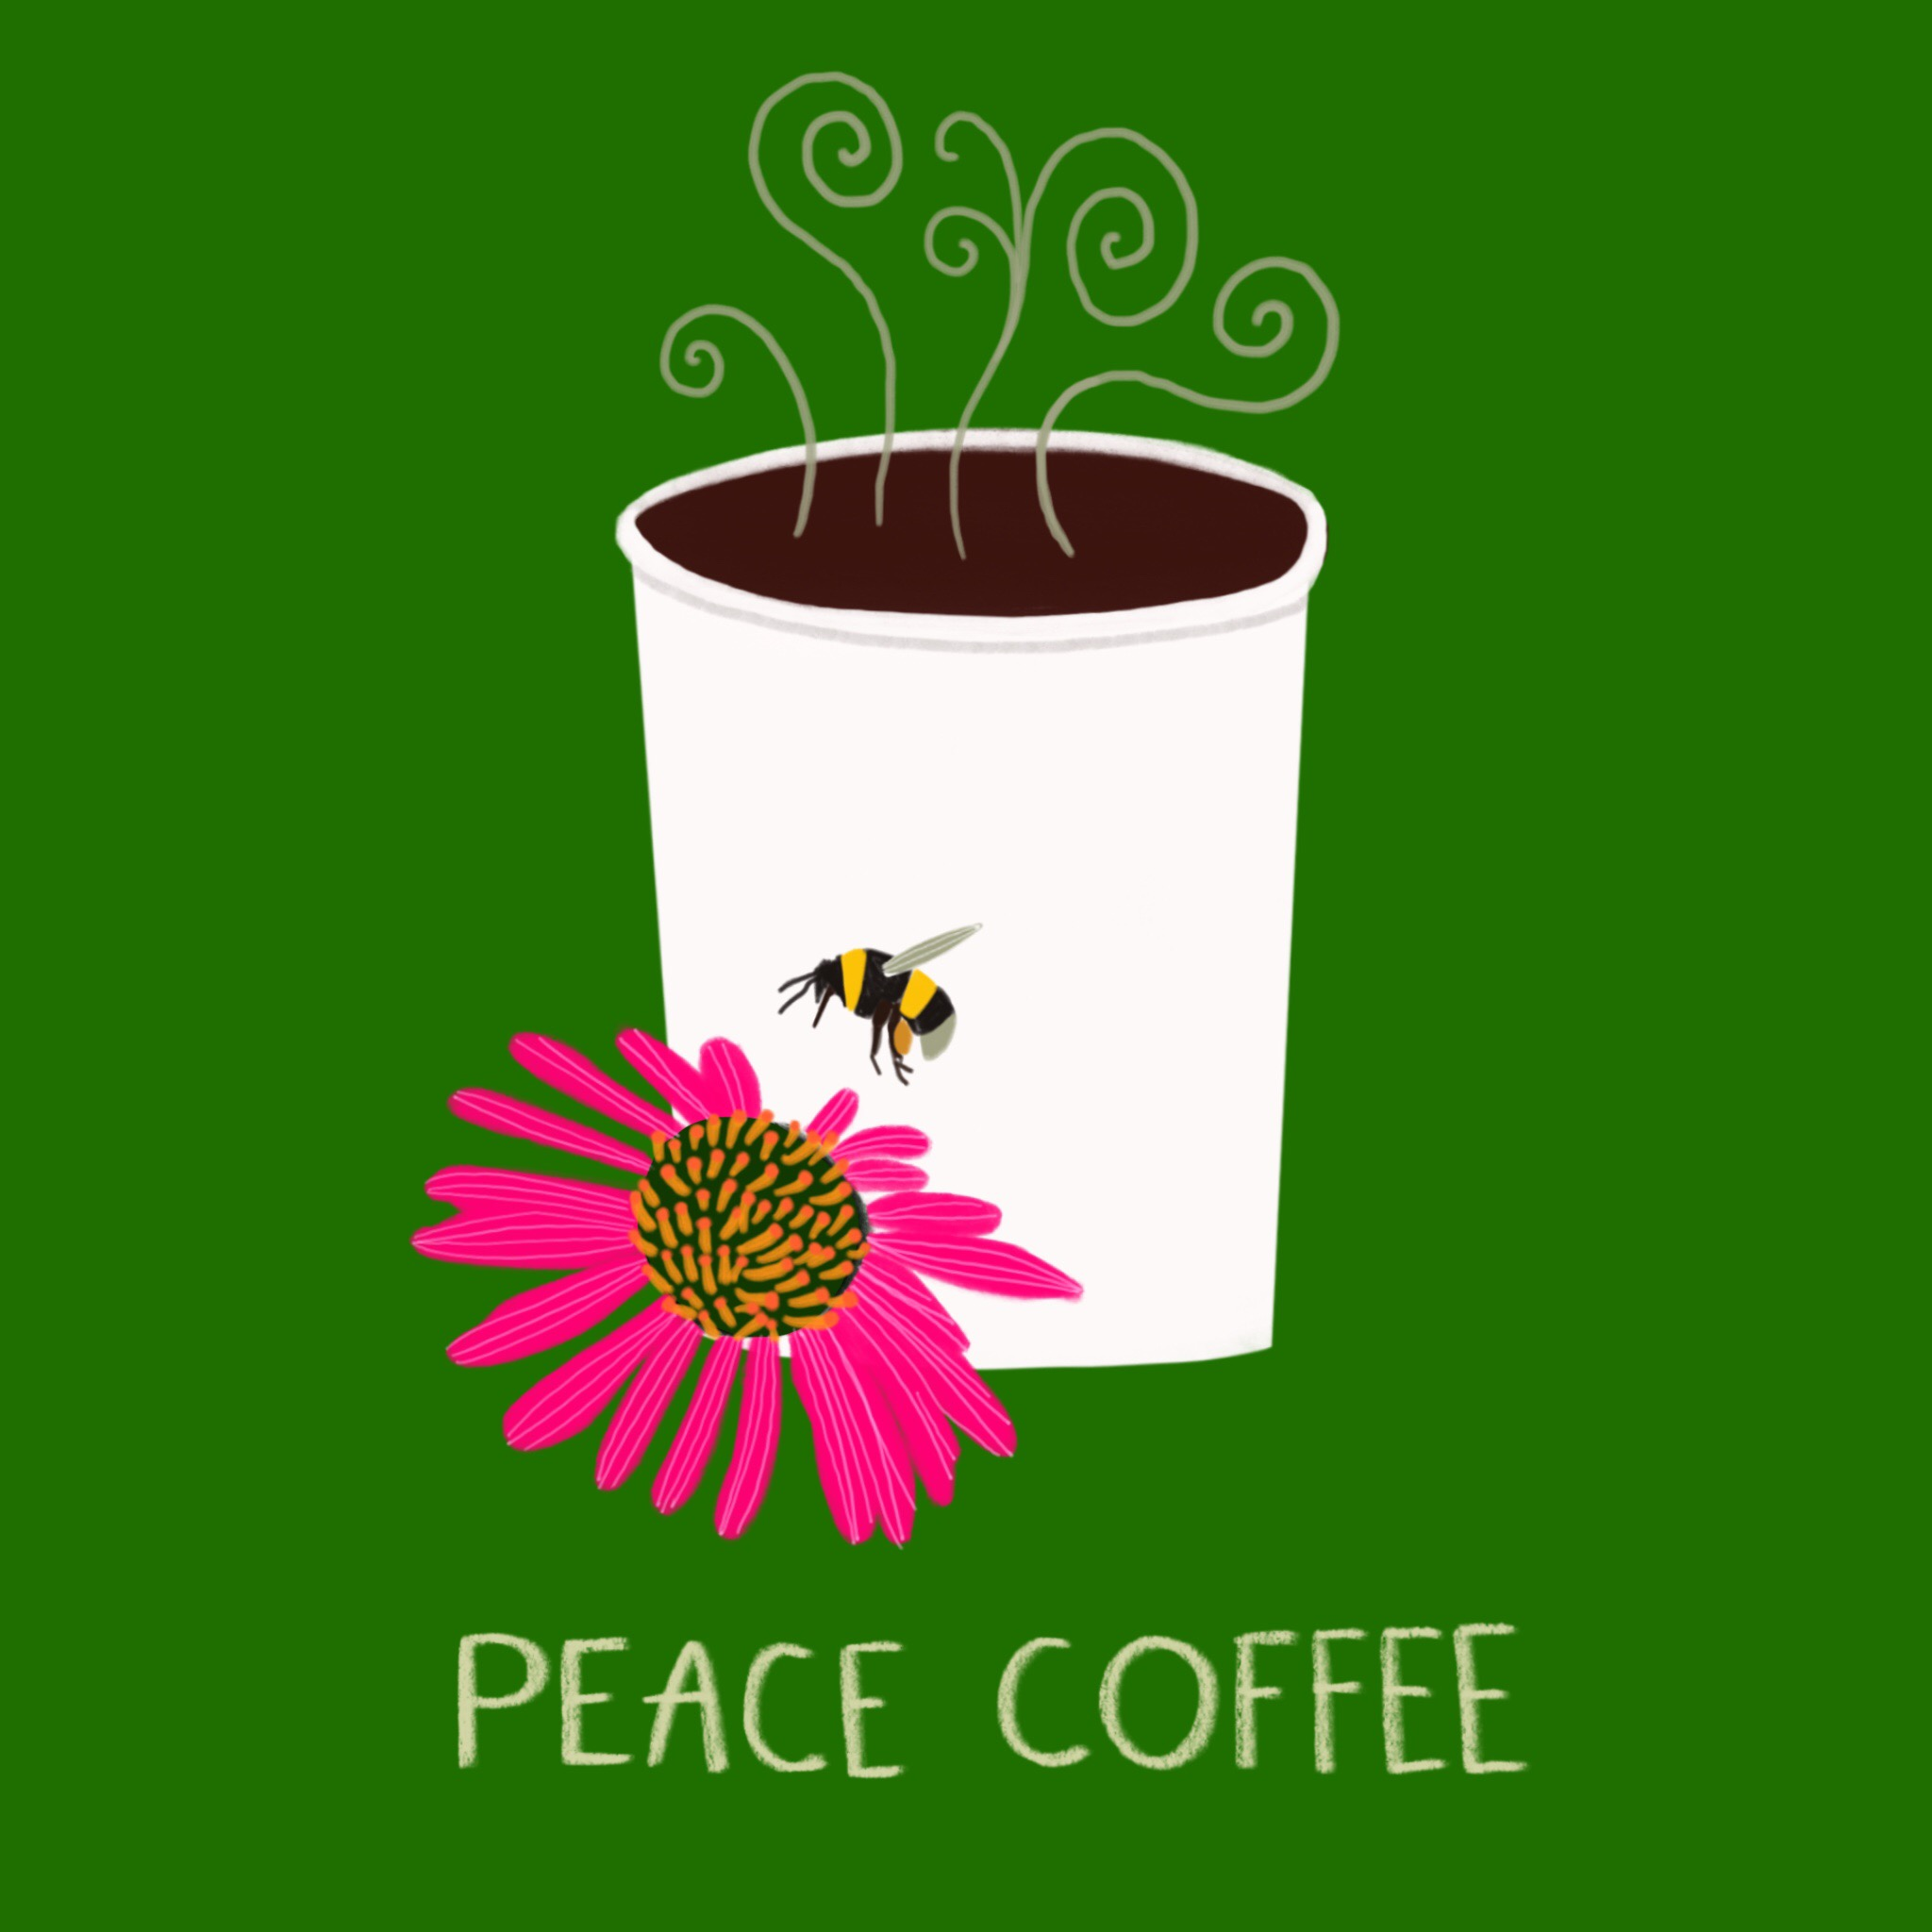 70_-_Peace_Coffee.jpg